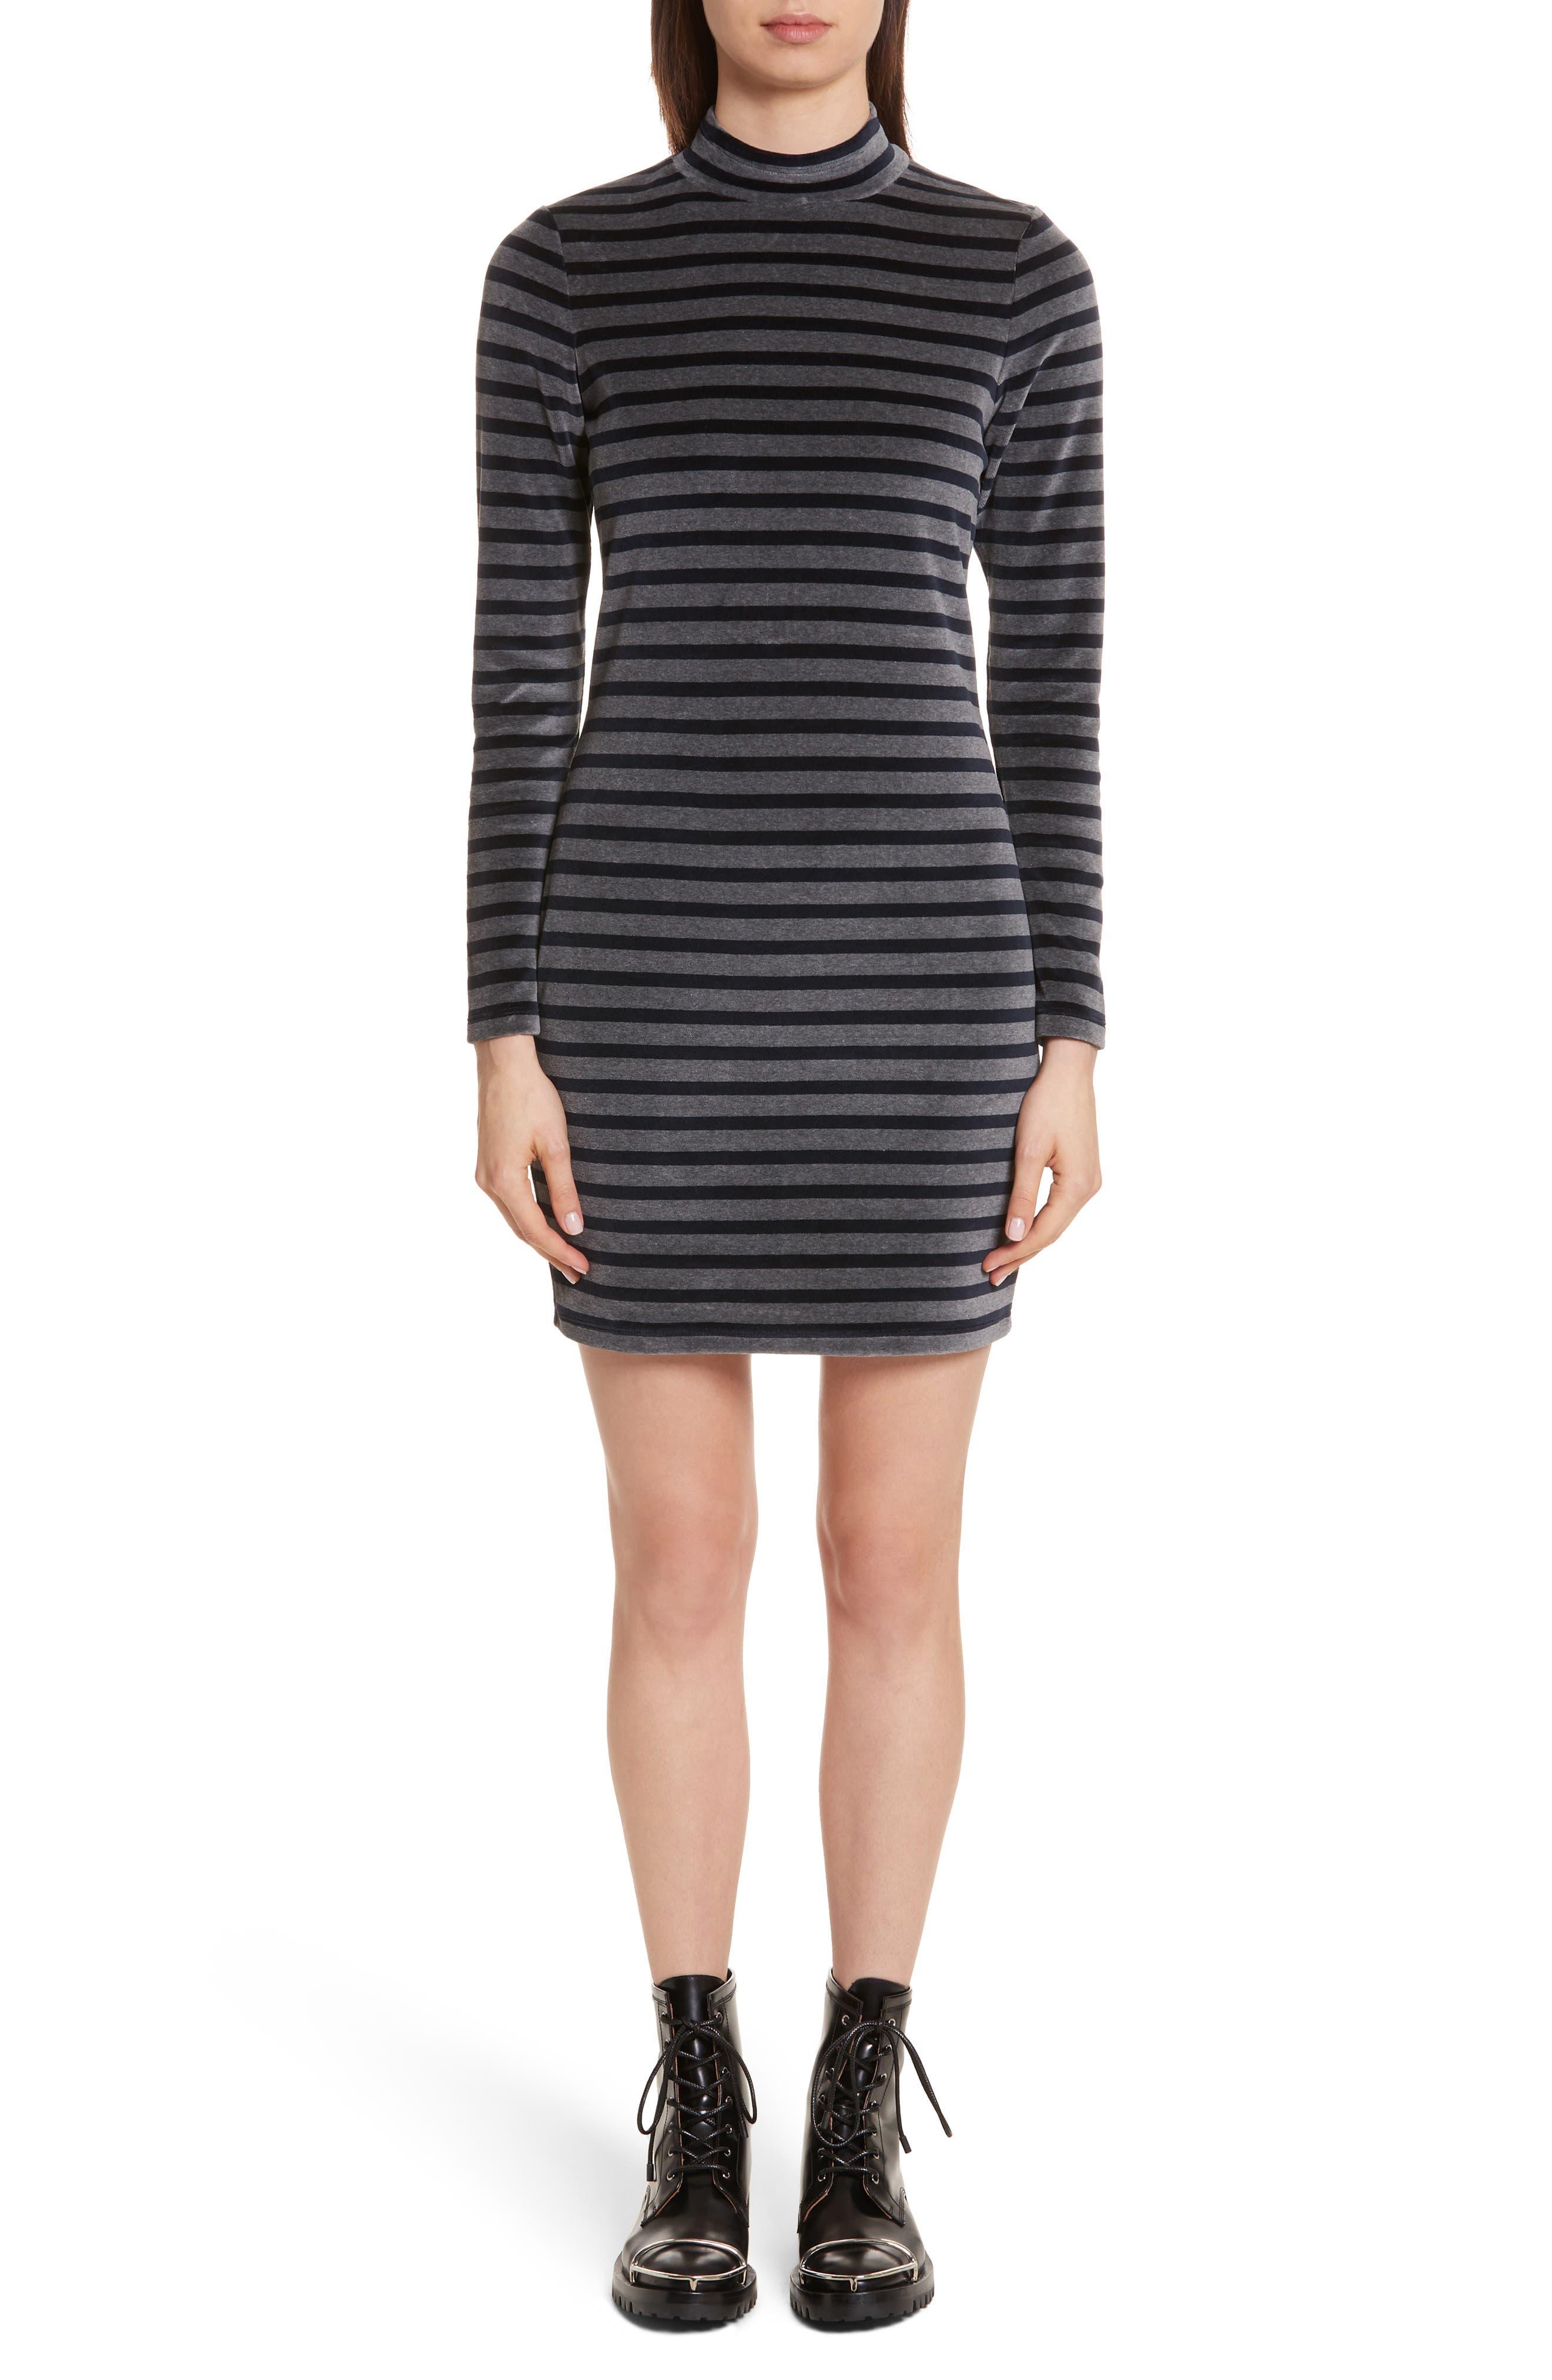 Alternate Image 1 Selected - T by Alexander Wang Stripe Velour Turtleneck Dress